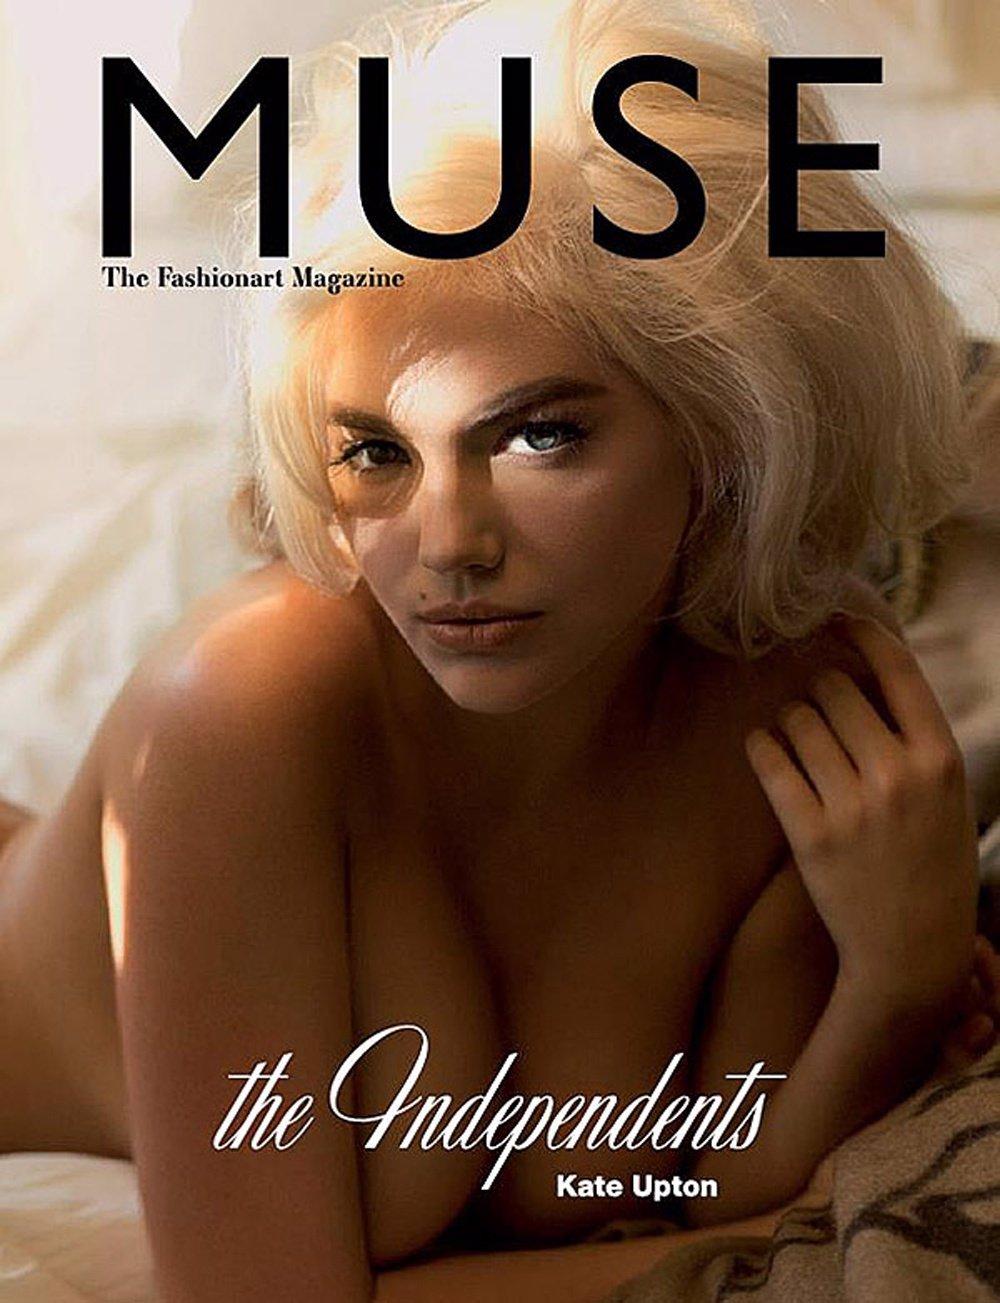 Kate Upton En La Portada De 'Muse'